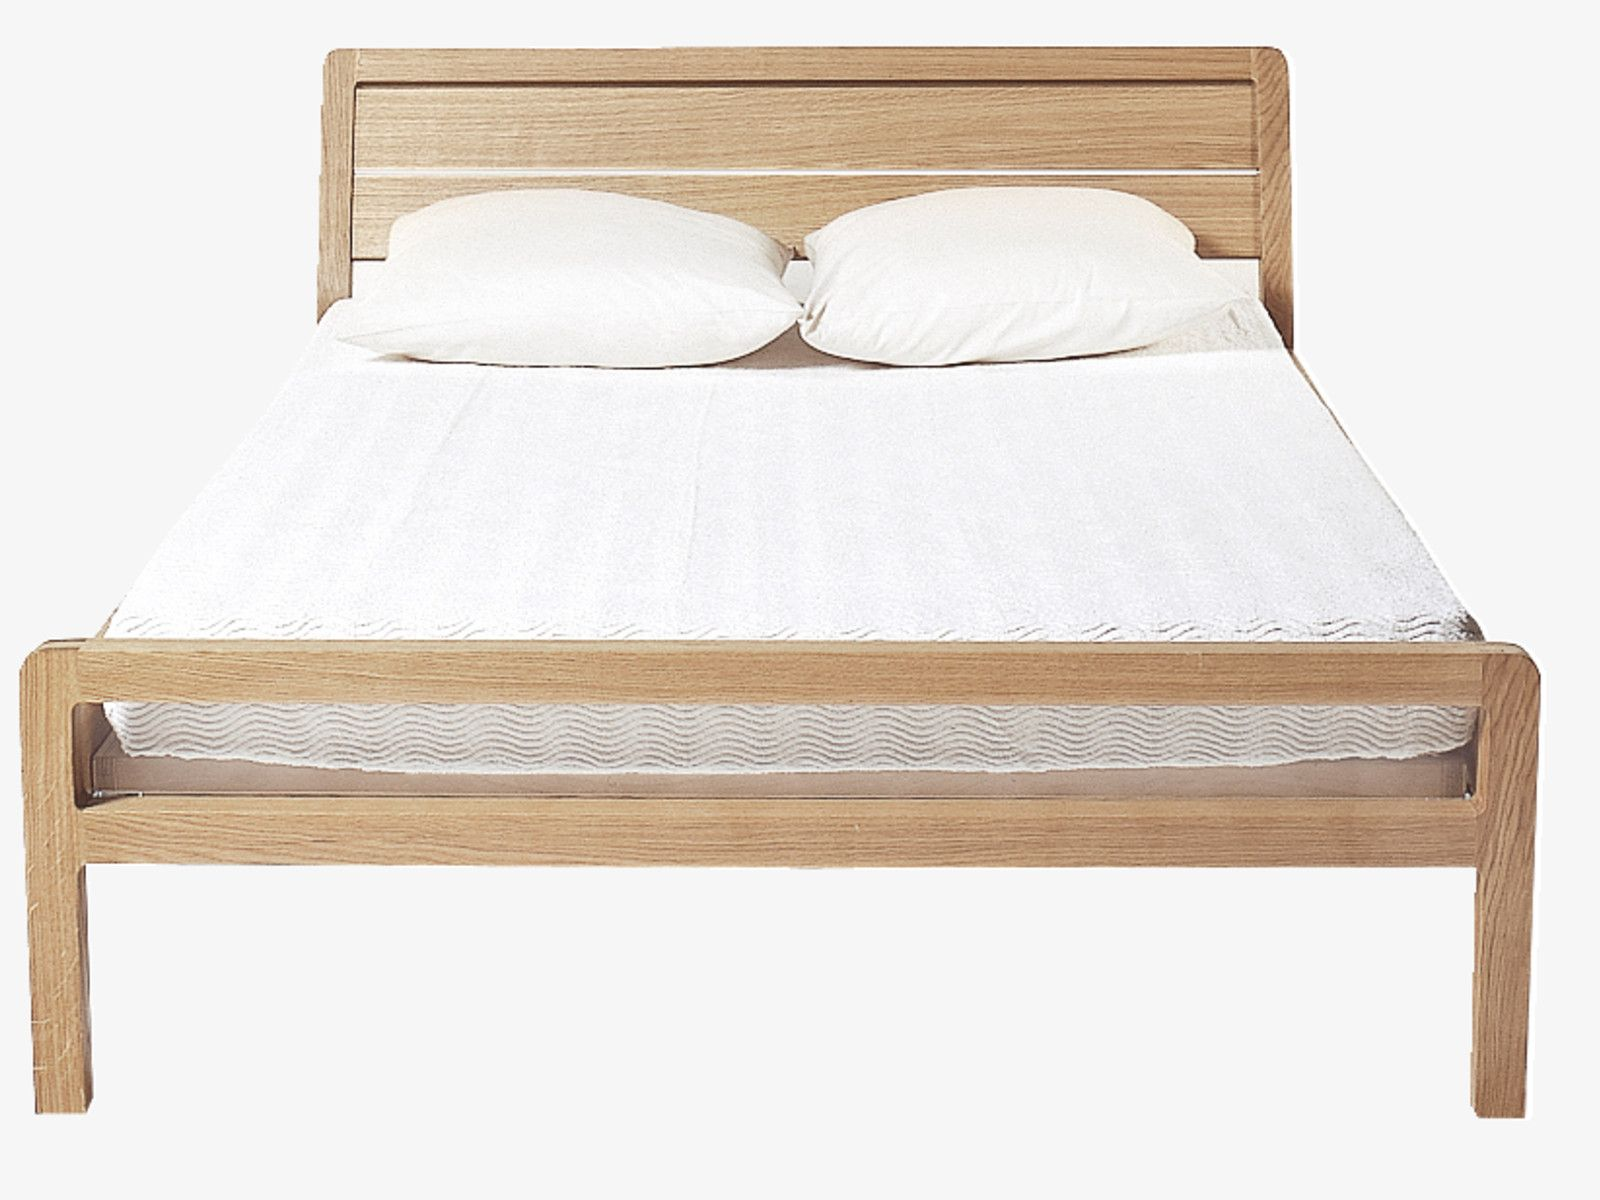 RADUS Holz Doppelbett, Groß   Betten Und Matratzen   Habitat